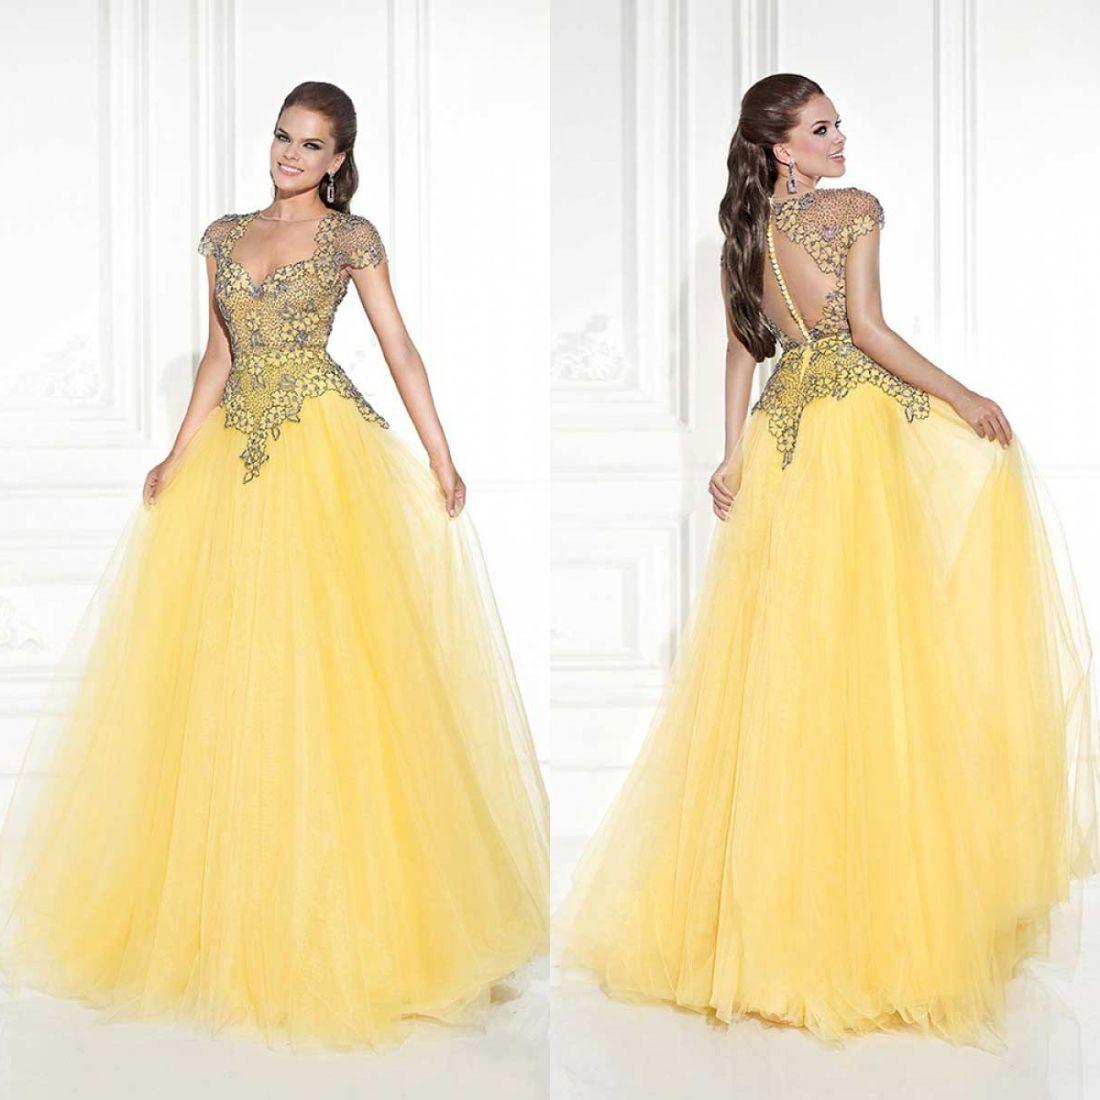 Princess 2015 Formal Tarik Ediz Yellow Daffodil Evening Dresses ...